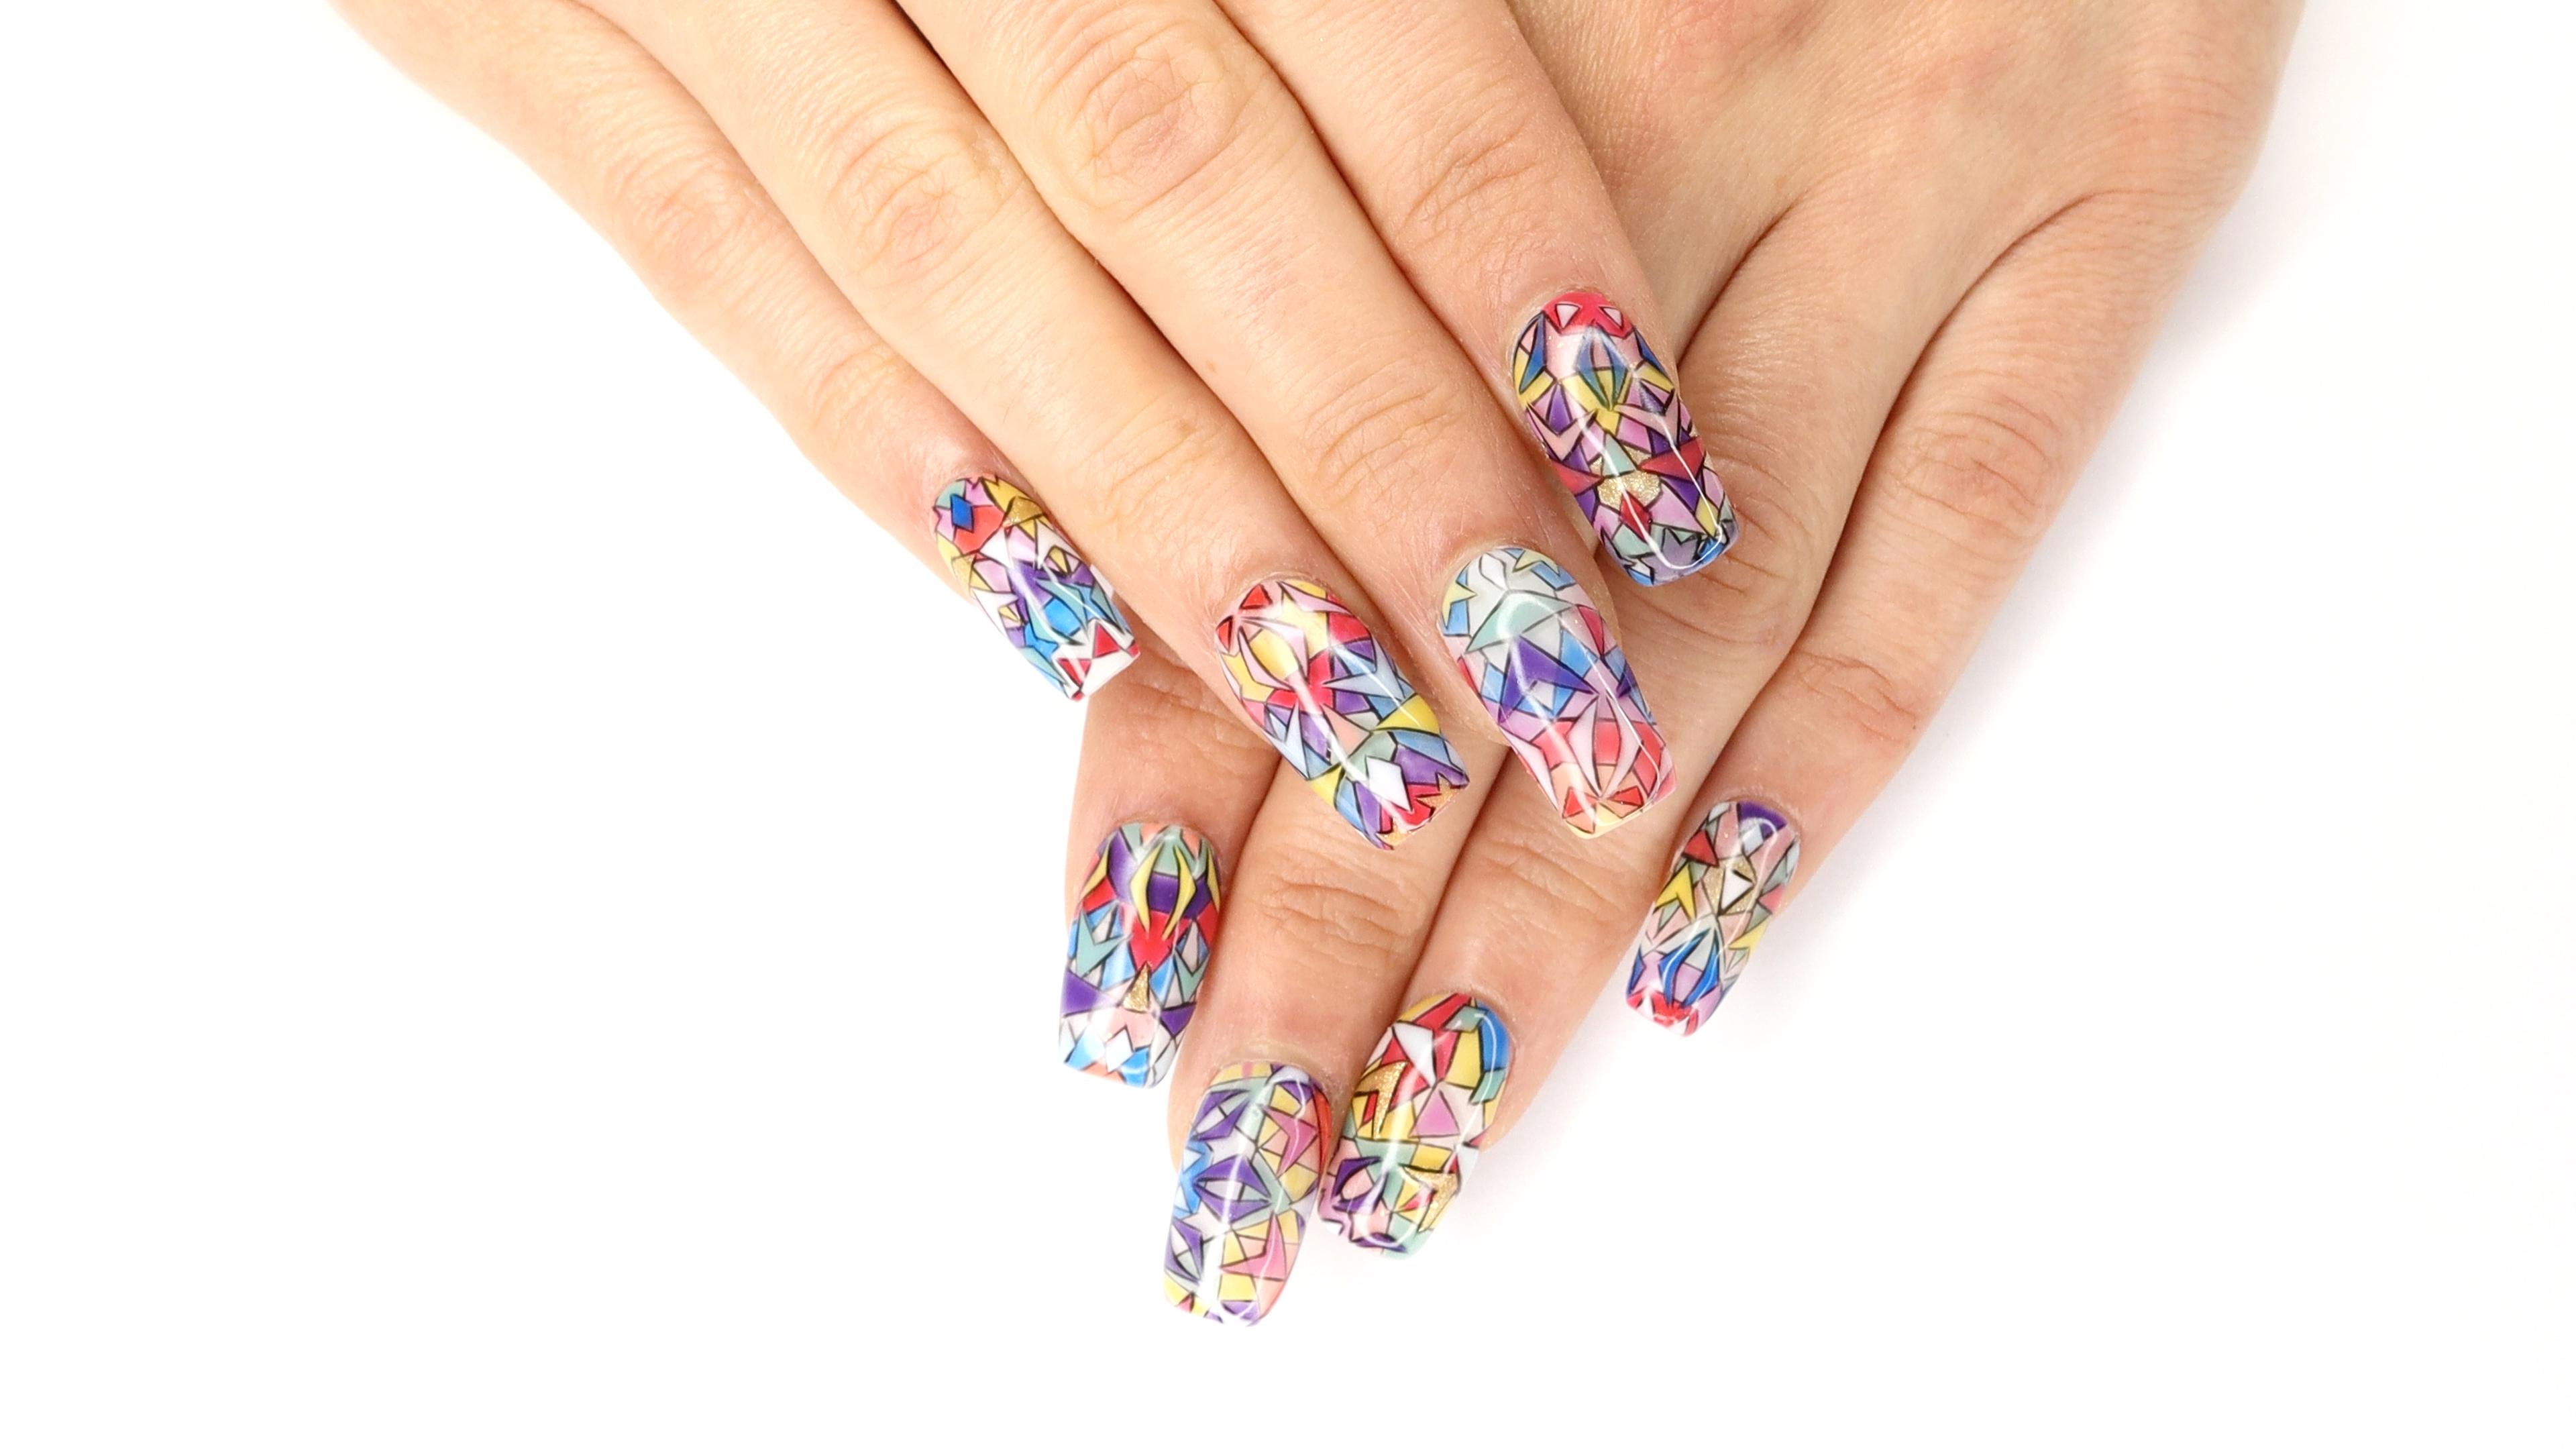 OPI NTNA Challenge 3: Kaleidoscope Nail Art (Julie)